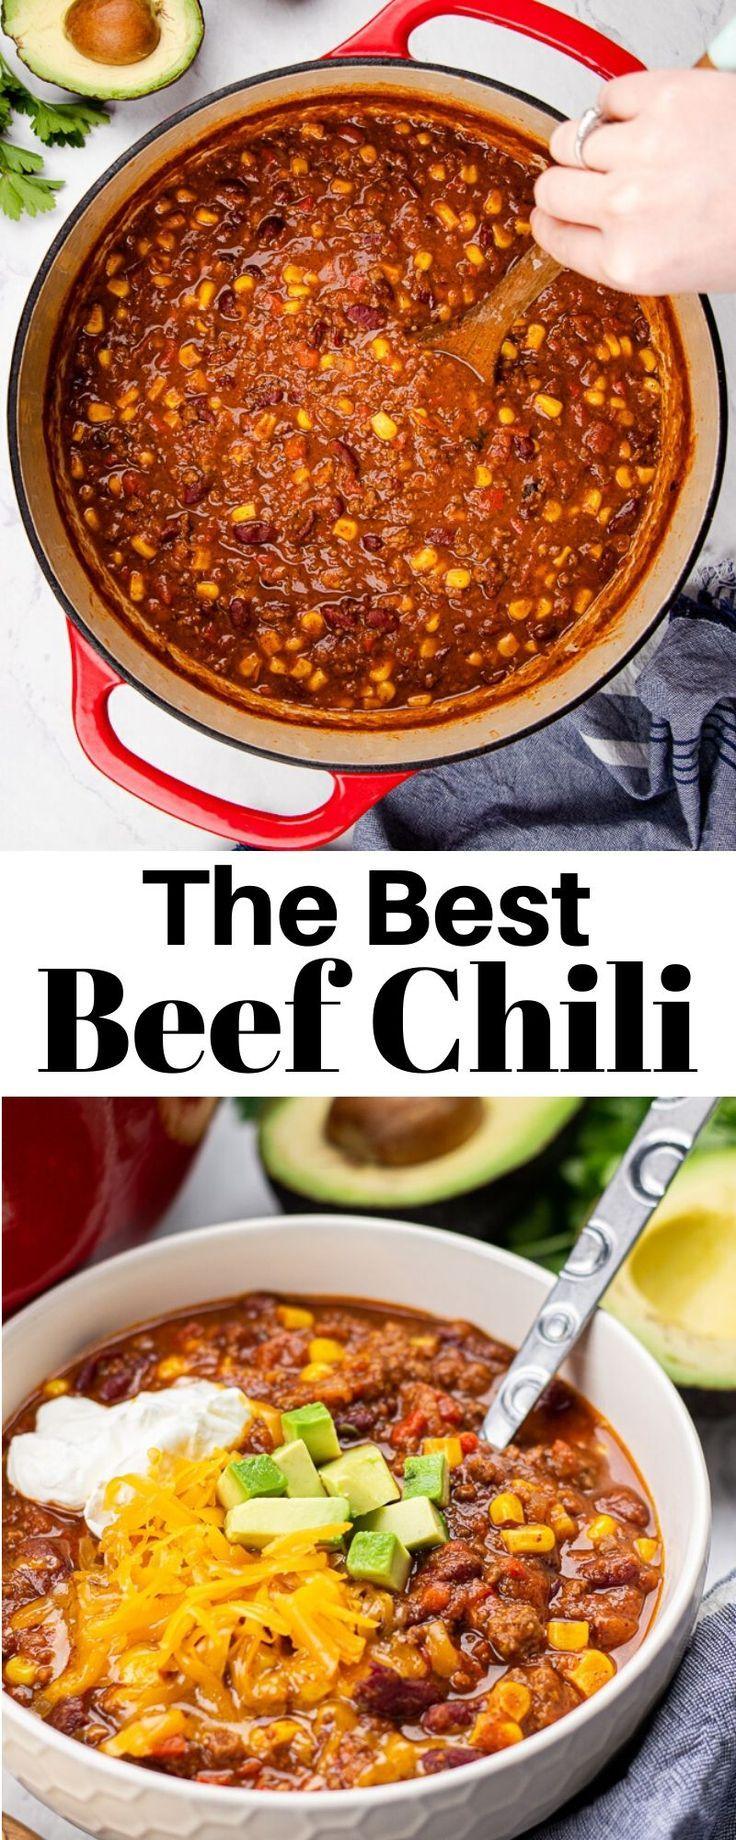 Best Beef Chili Recipe Veronika S Kitchen Recipe In 2020 Beef Chili Chili Recipes Beef Chili Recipe